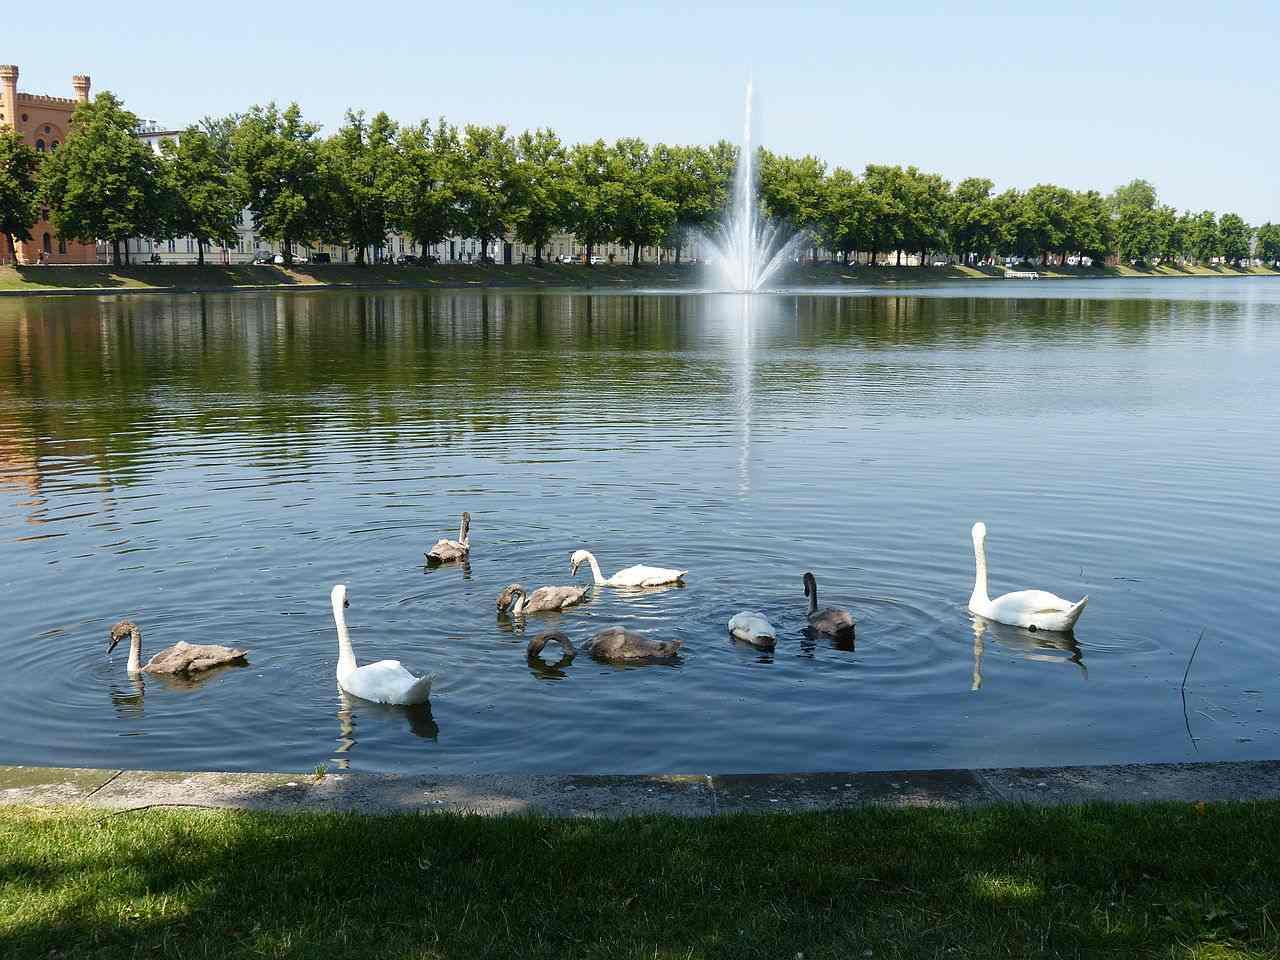 Lake Schwerin, Germany